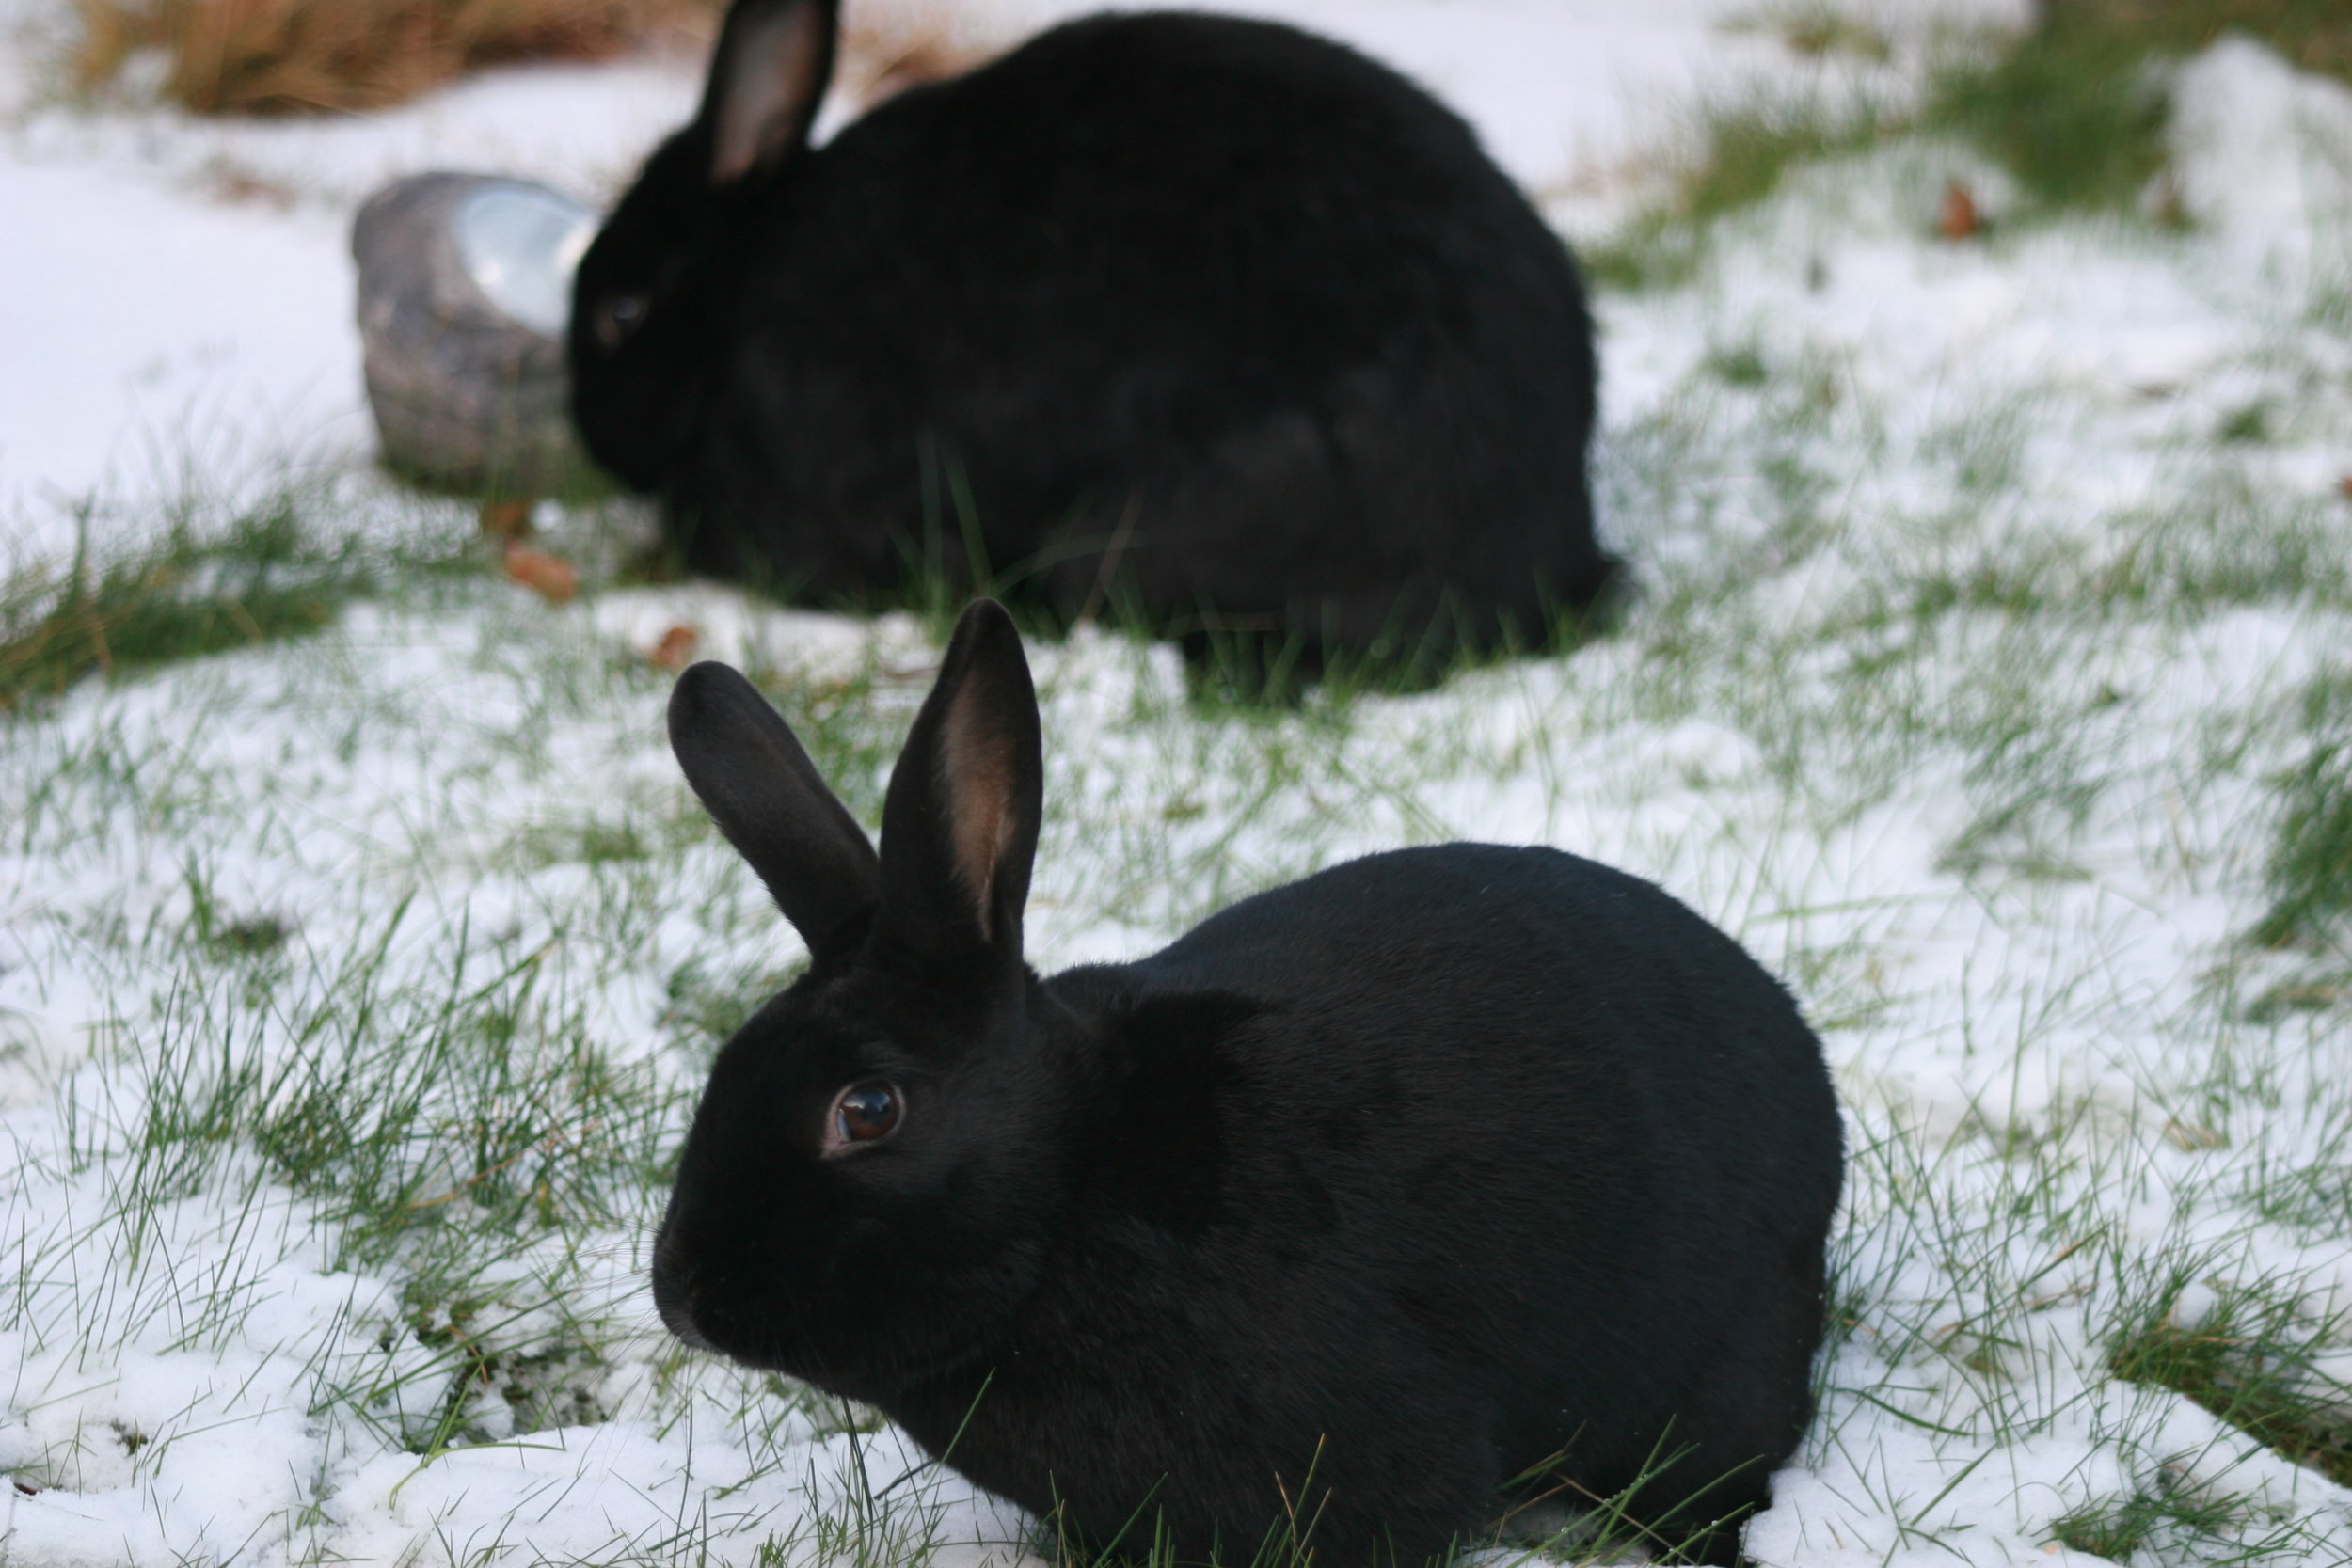 Bunnies Explore the Snowy Yard